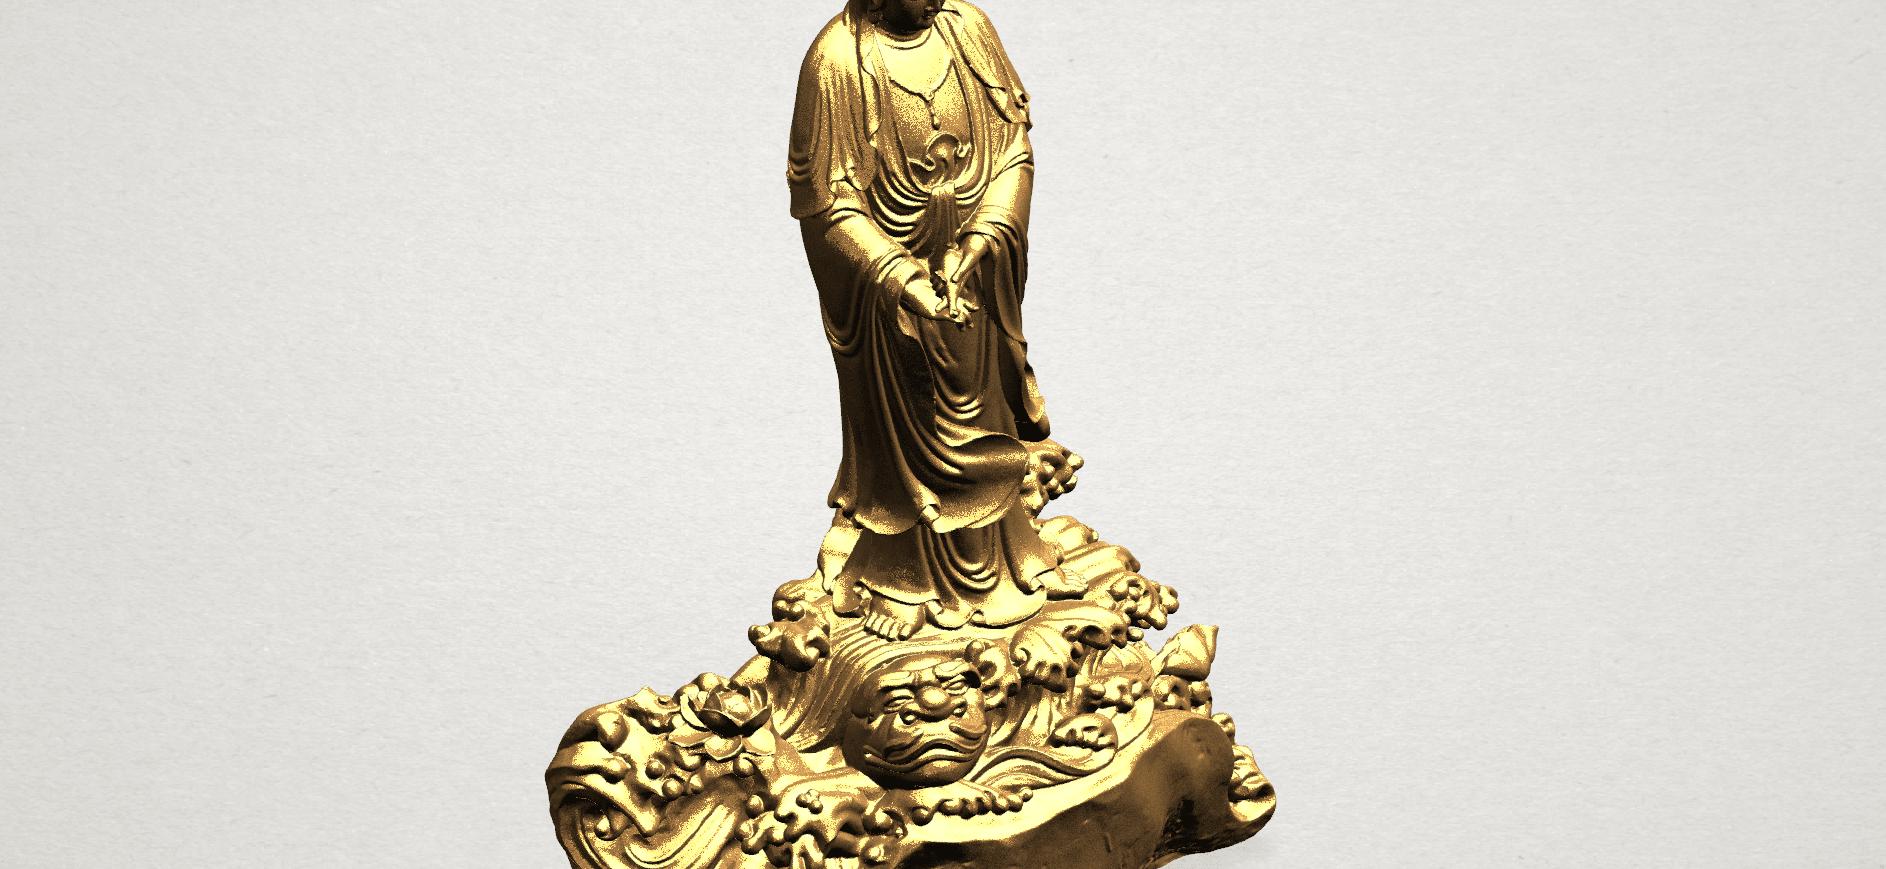 Avalokitesvara Buddha - Standing (ii) A09.png Download free STL file Avalokitesvara Bodhisattva - Standing 02 • Design to 3D print, GeorgesNikkei